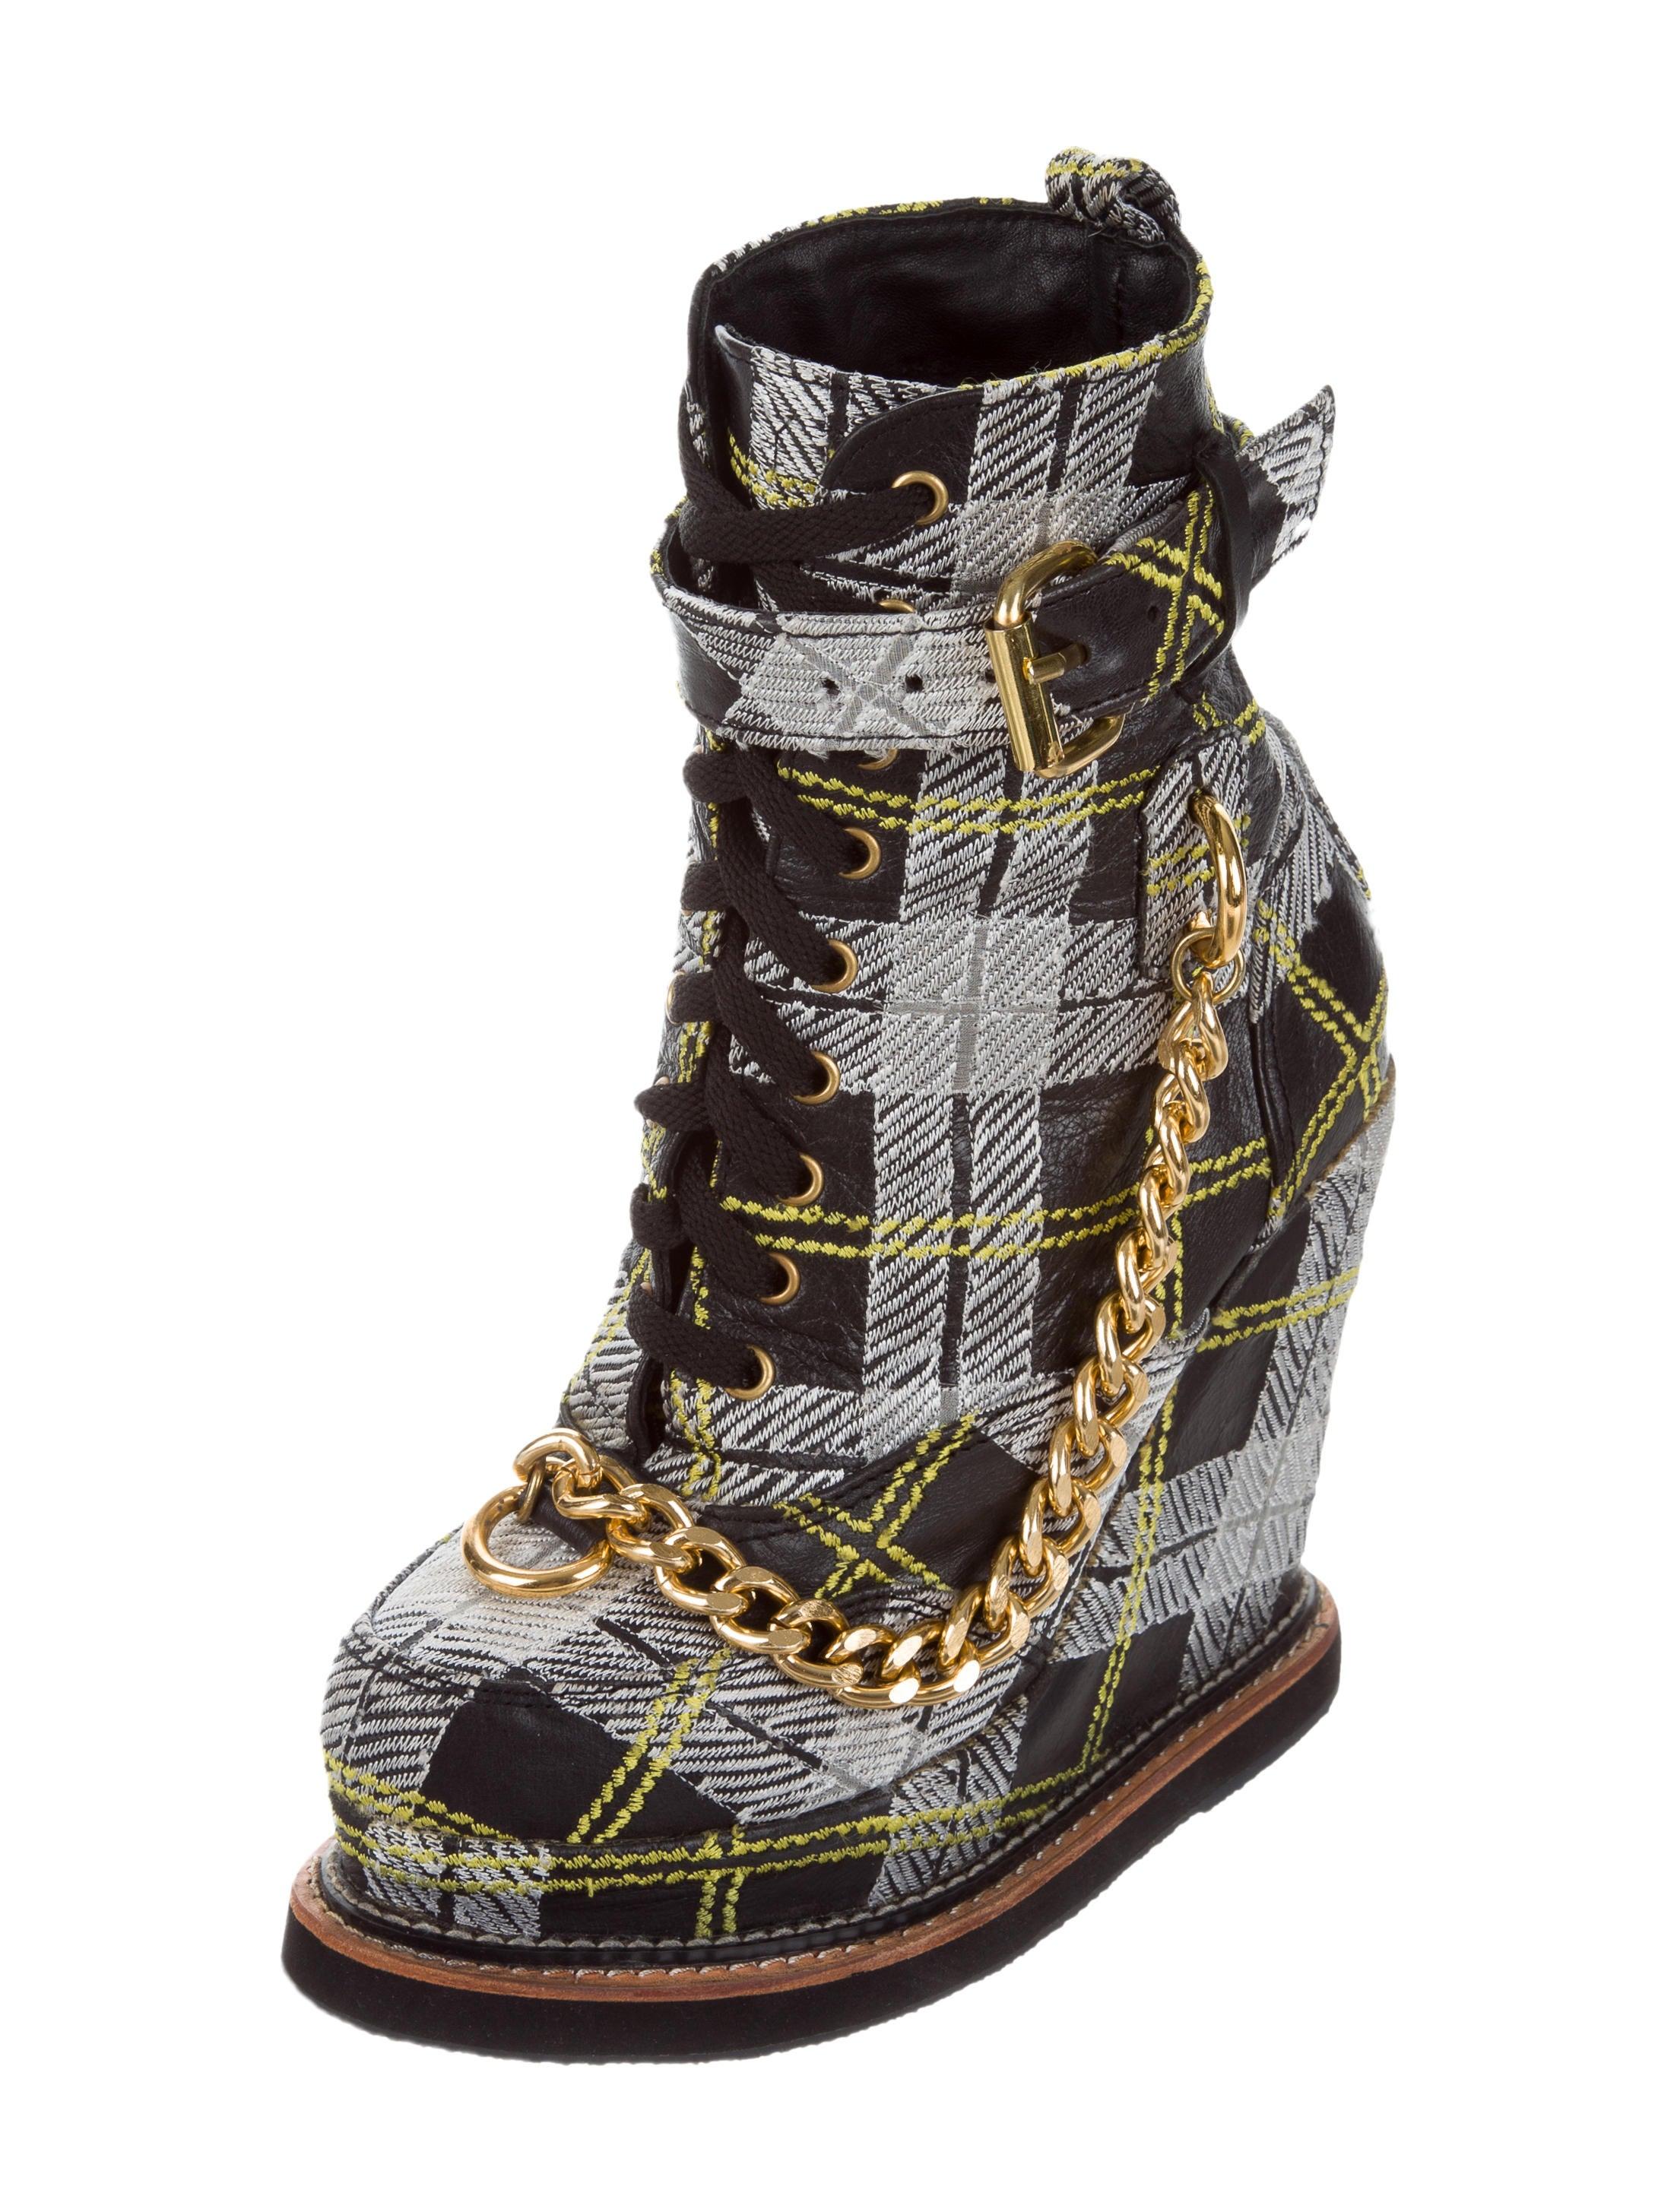 KTZ Plaid Mid-Calf Wedge Boots discount codes shopping online XNb8NIlZtW